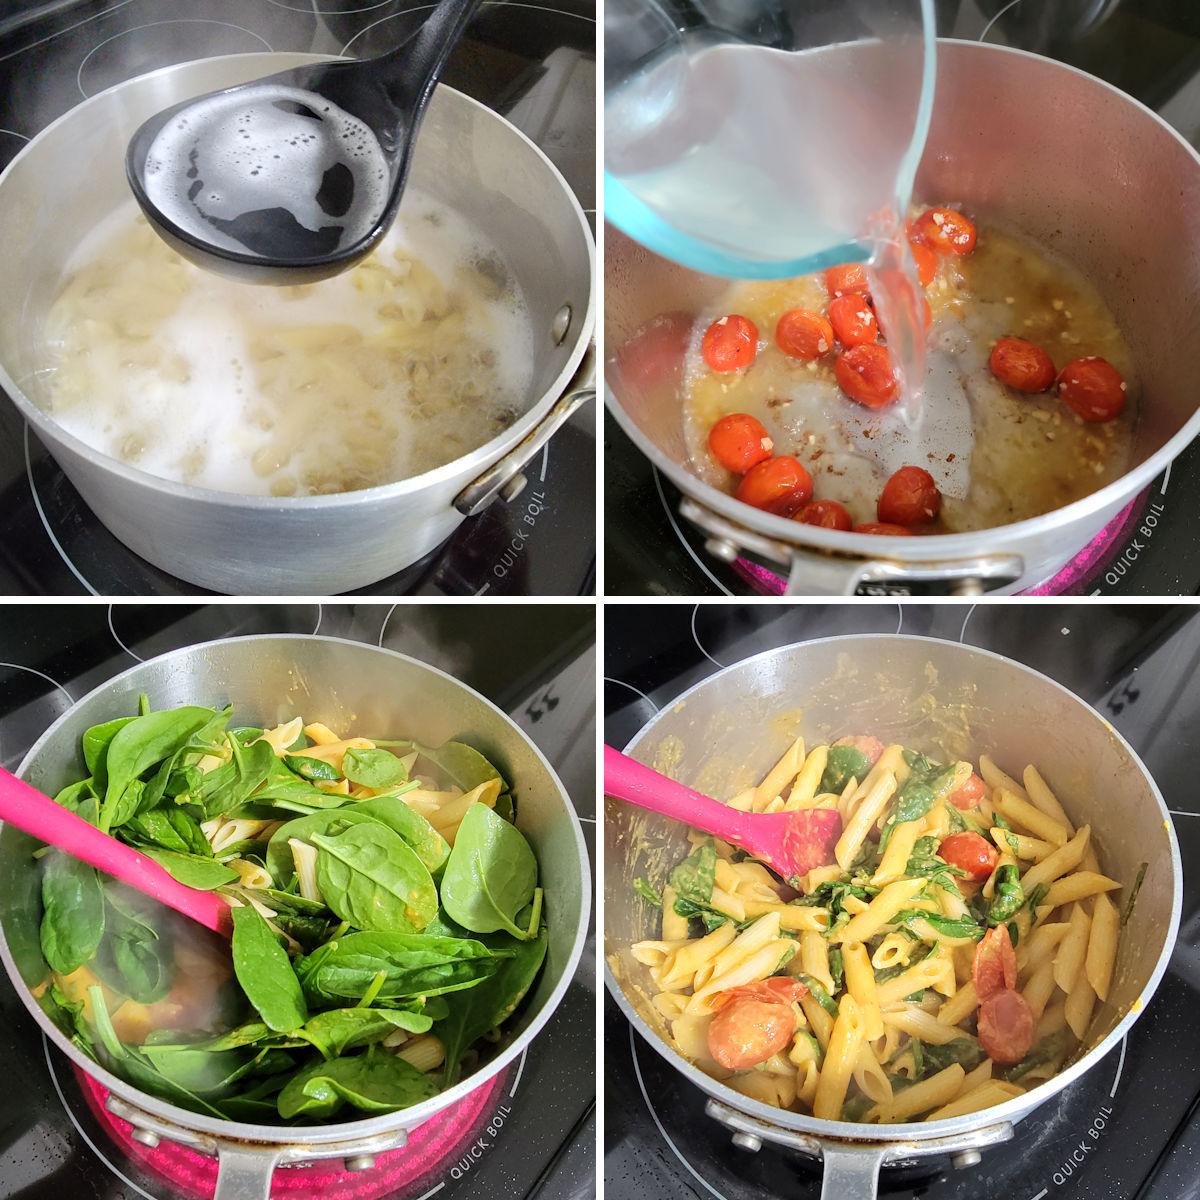 Making hummus pasta in a stock pot.